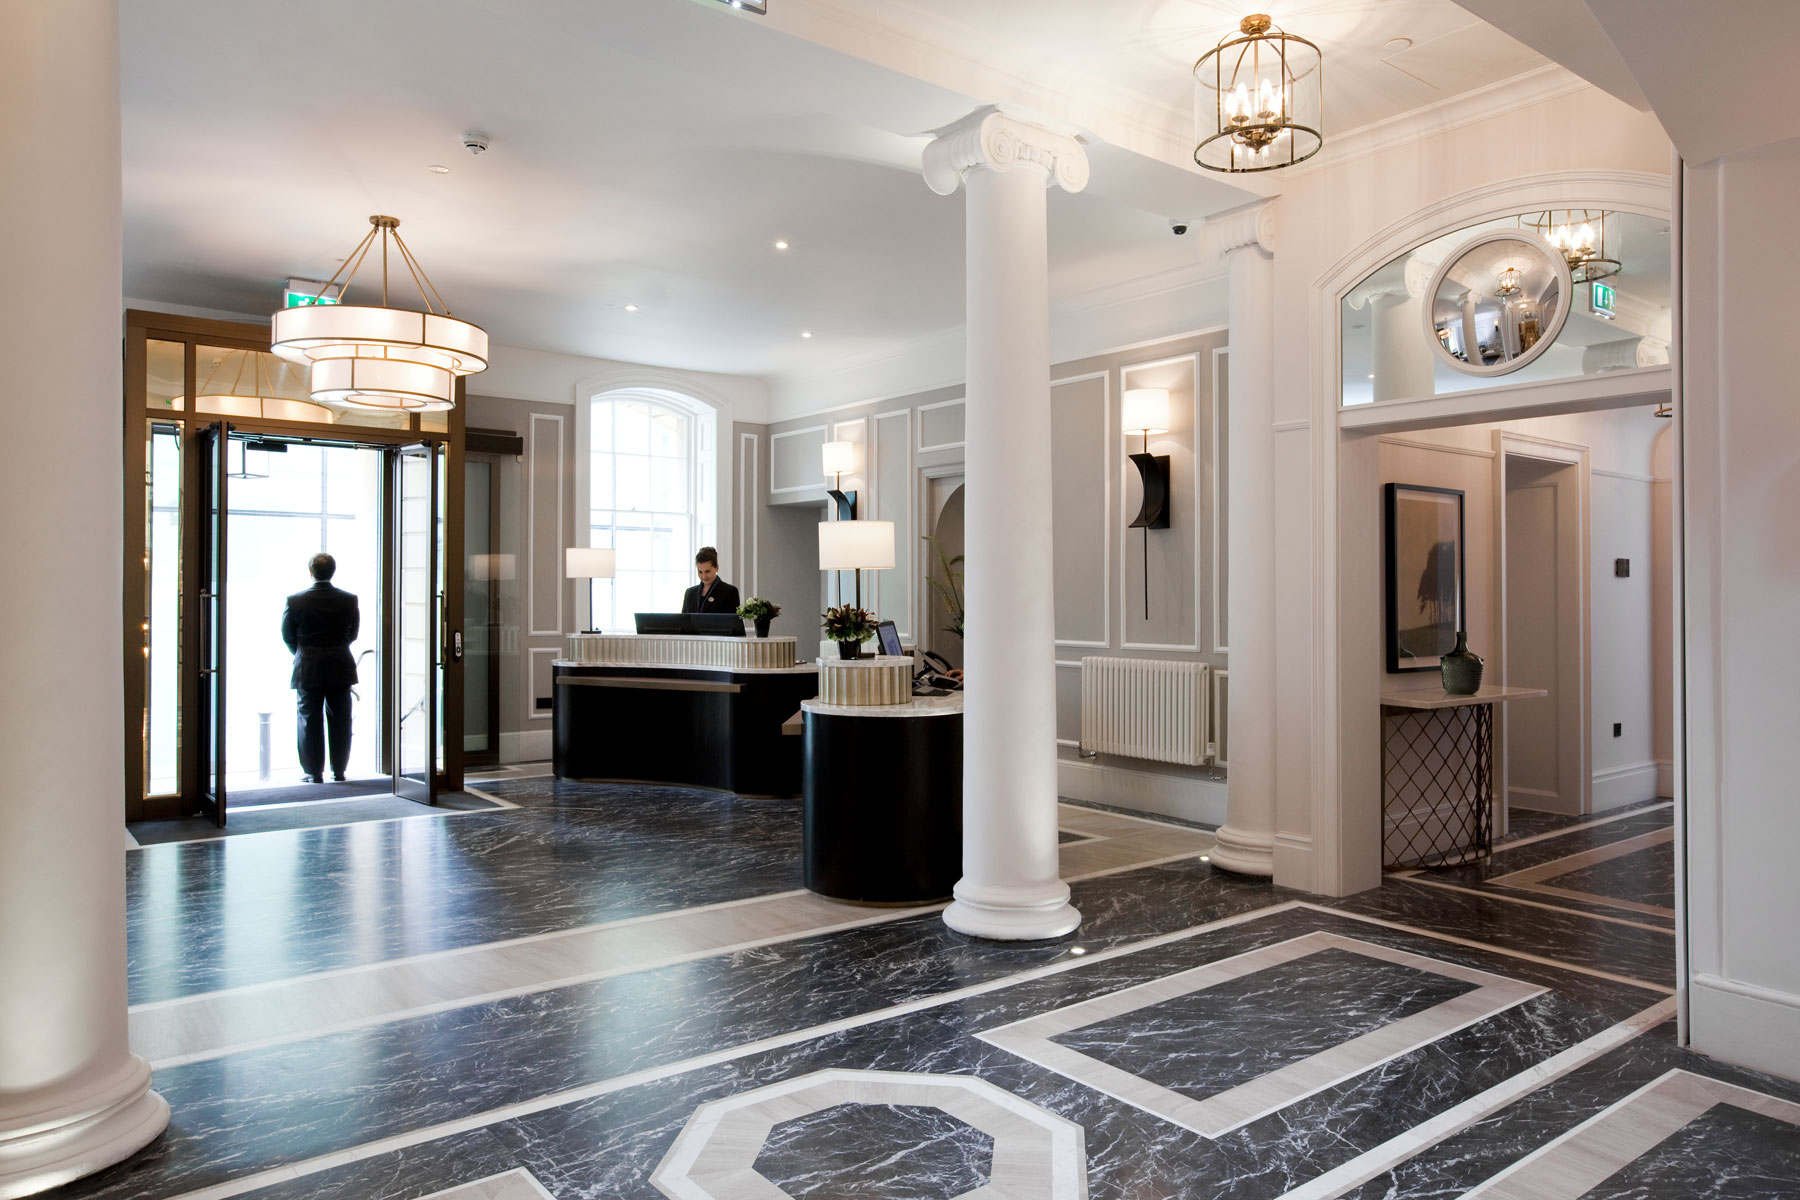 Hotel Foyer Spa : Healing through water at the gainsborough hotel wellness